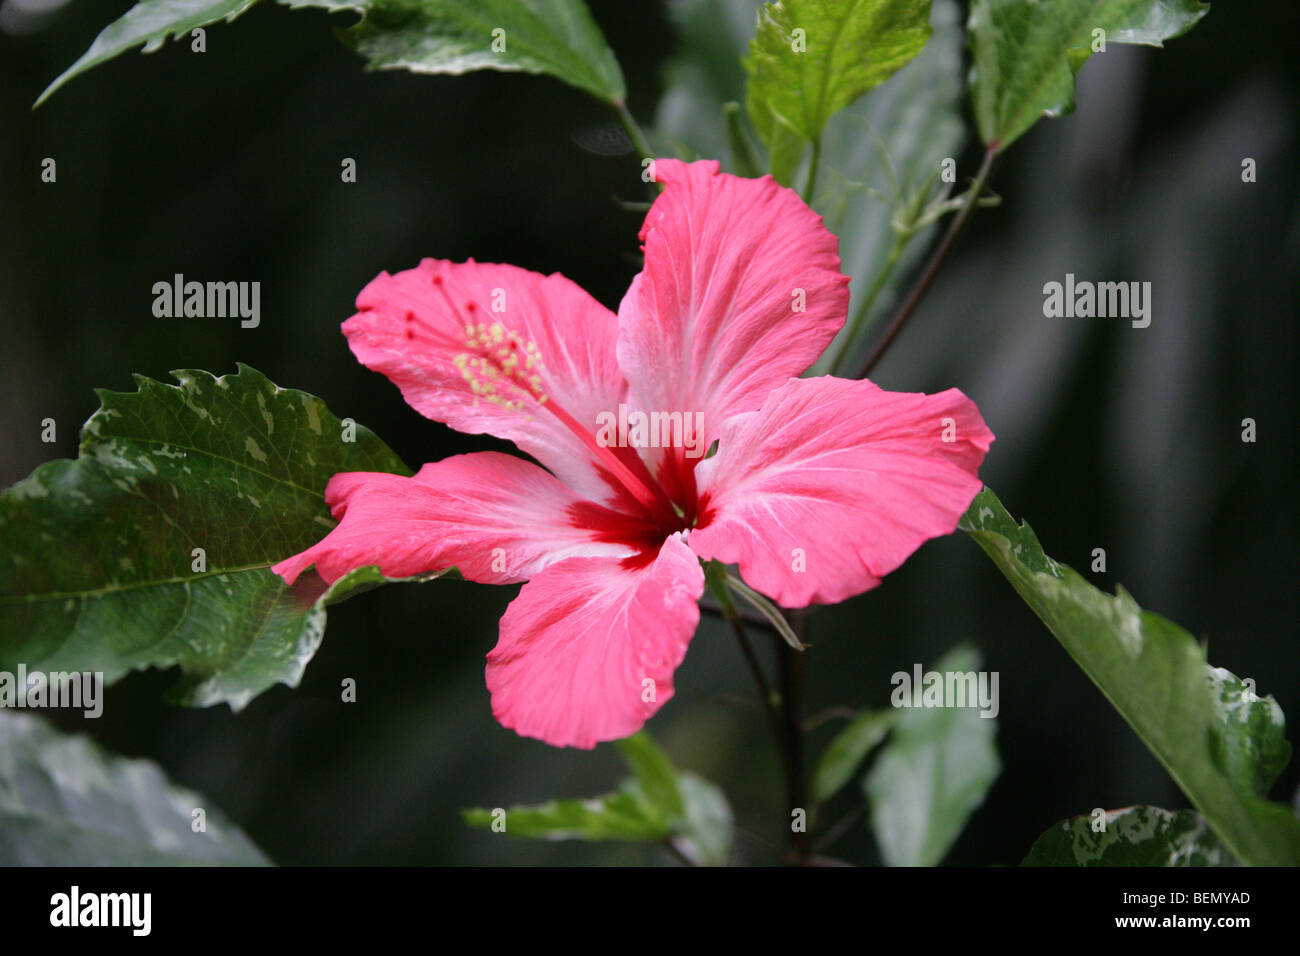 China Rose Flower Stock Photos China Rose Flower Stock Images Alamy